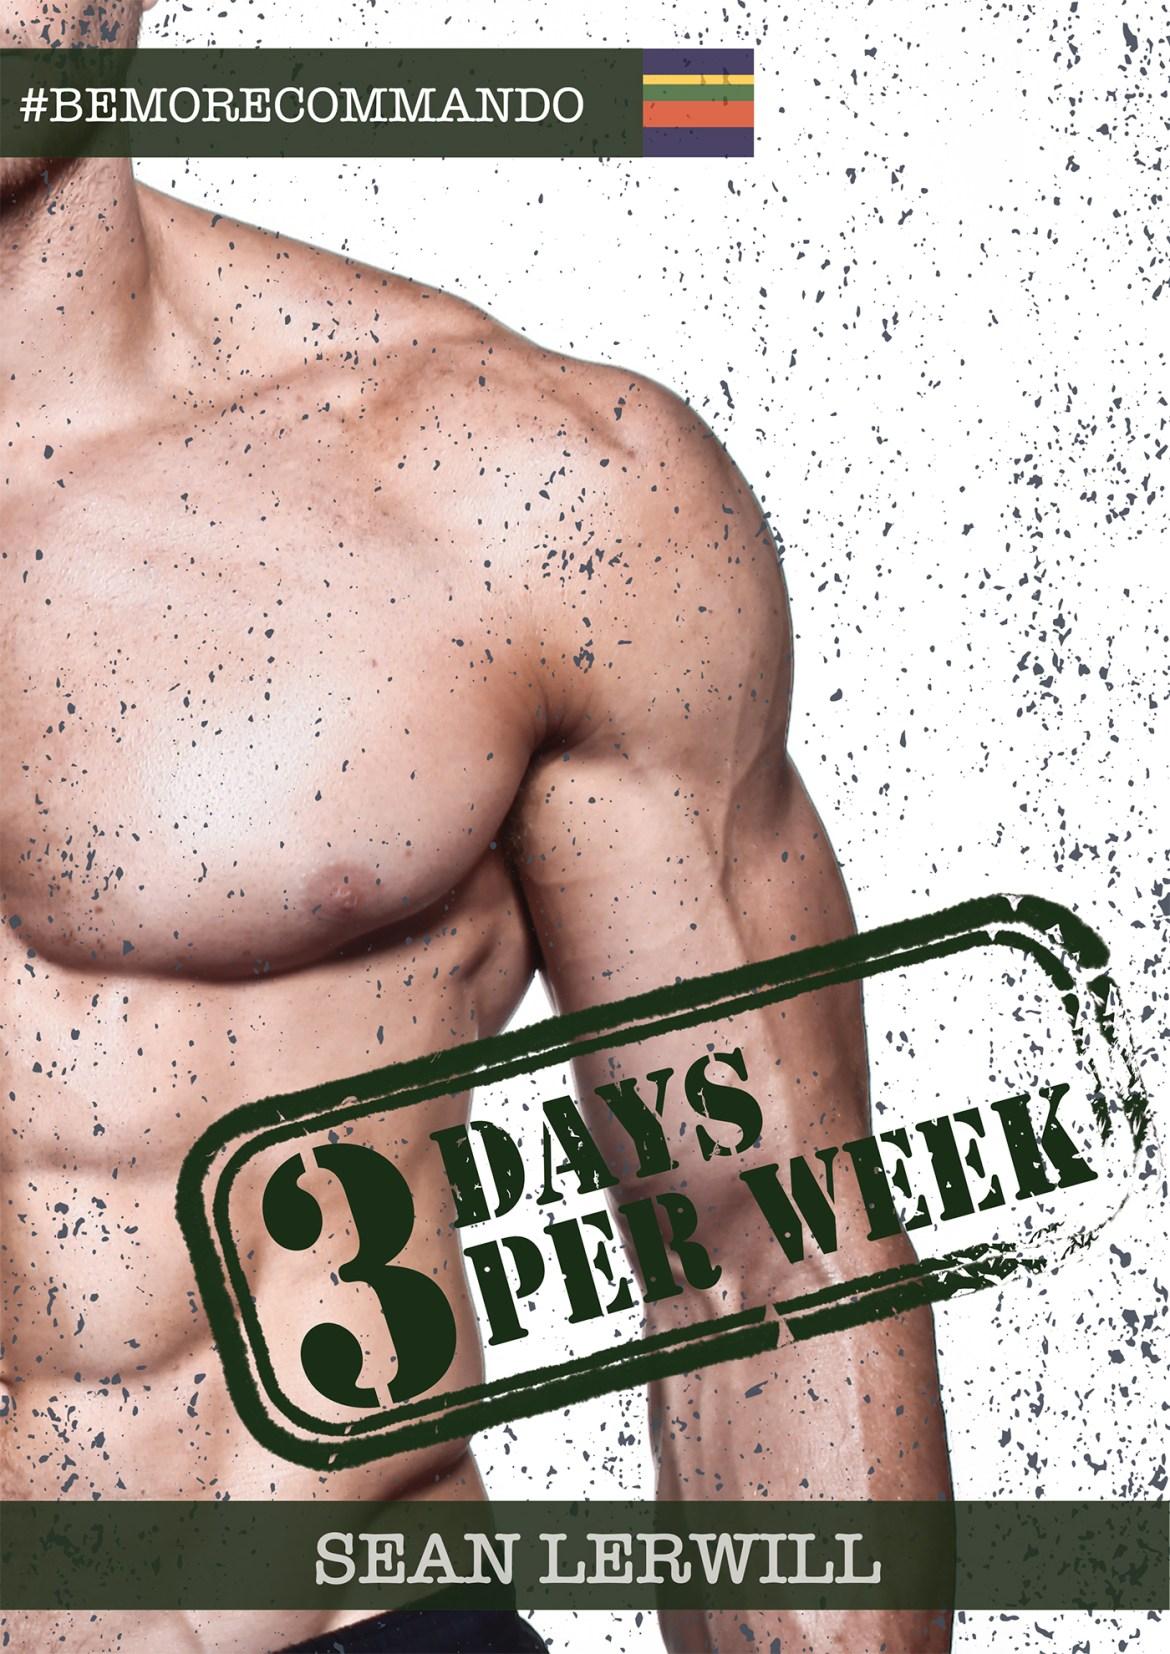 3 Days Per Week